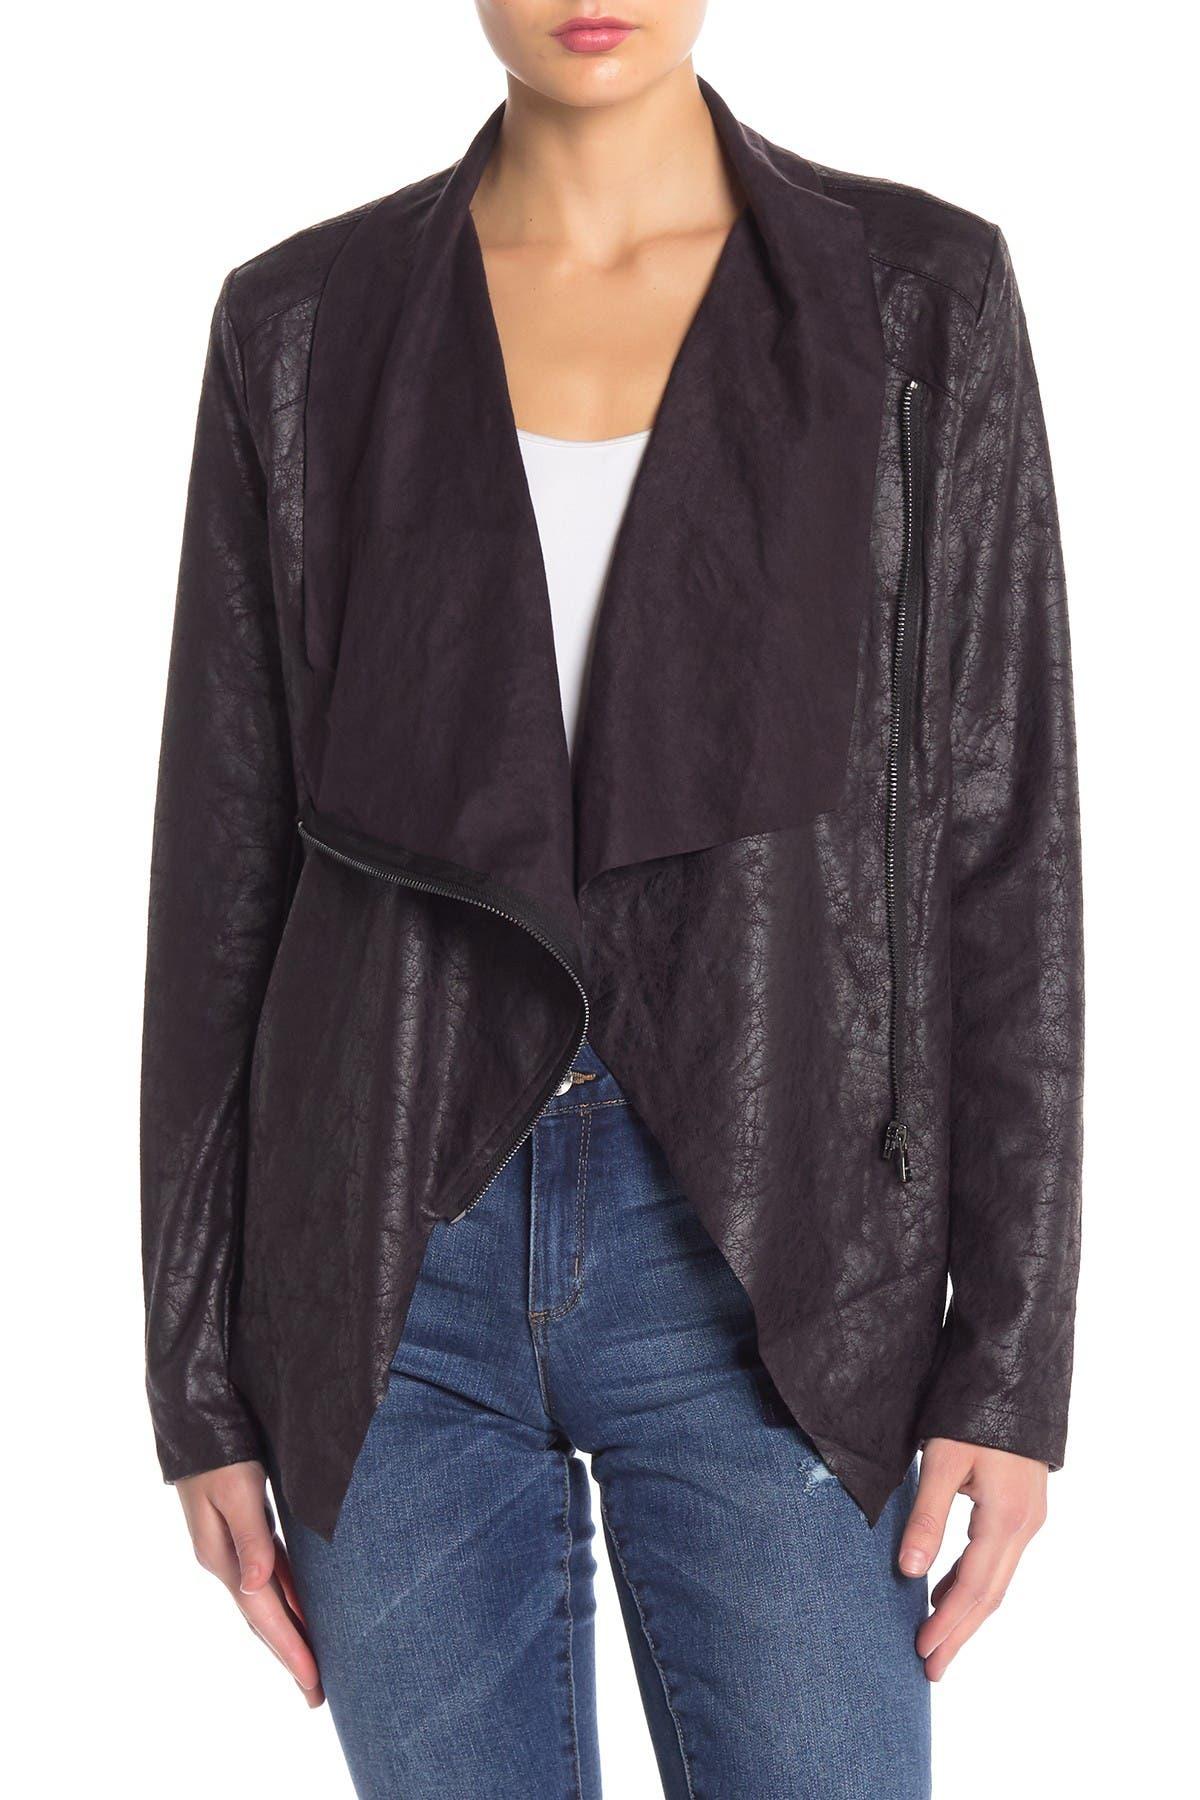 Image of Vigoss Crackle Wrap Jacket